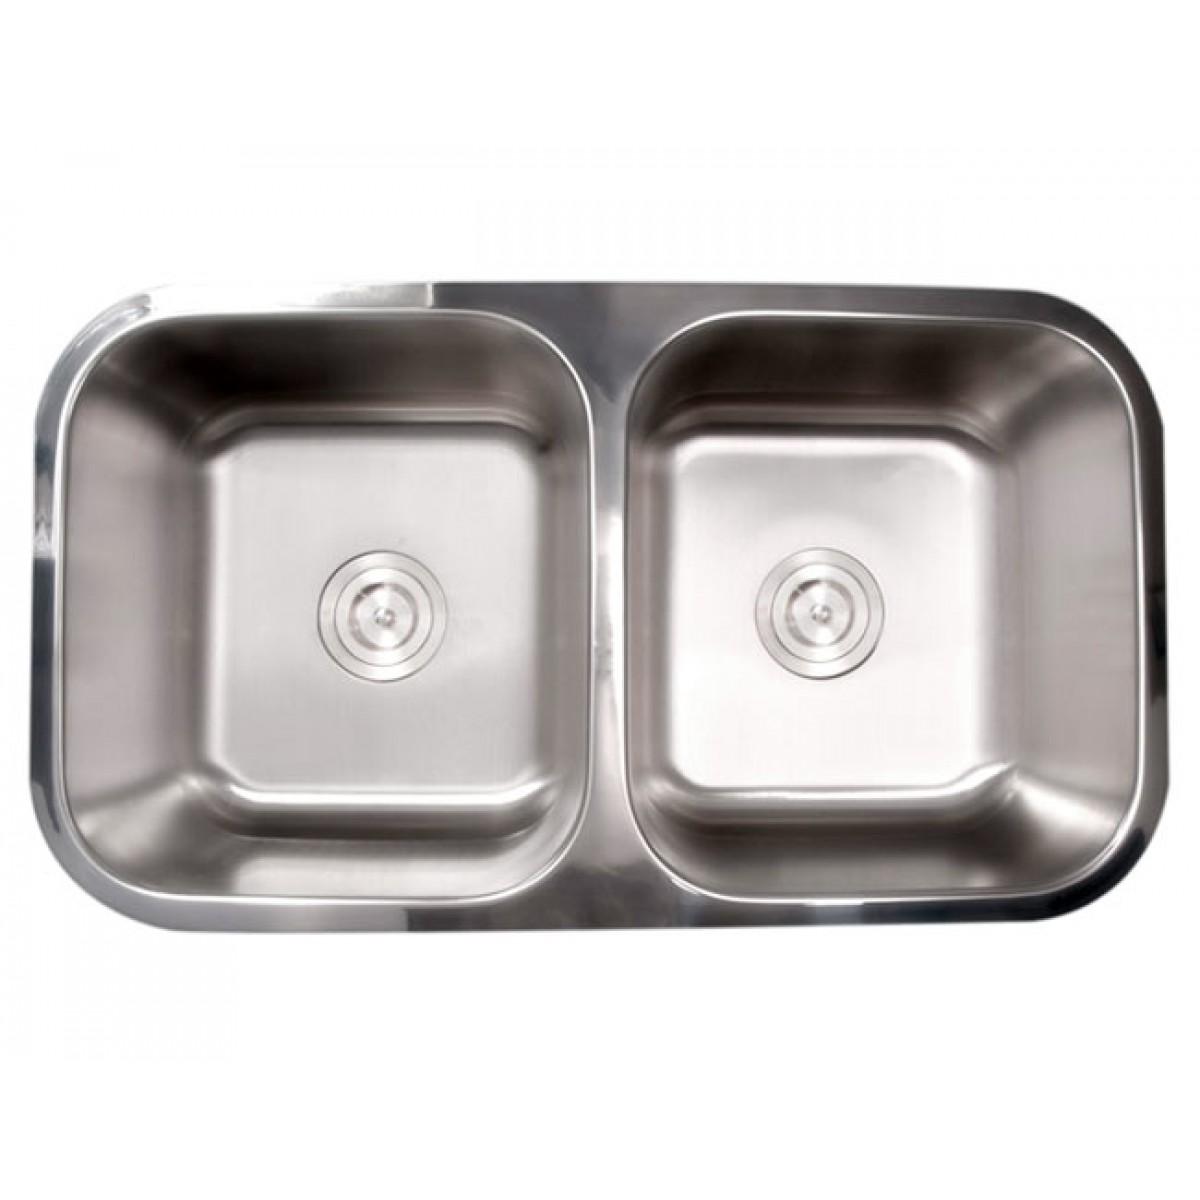 Bella 32 Inch Stainless Steel Undermount 50/50 Double Bowl Kitchen ...